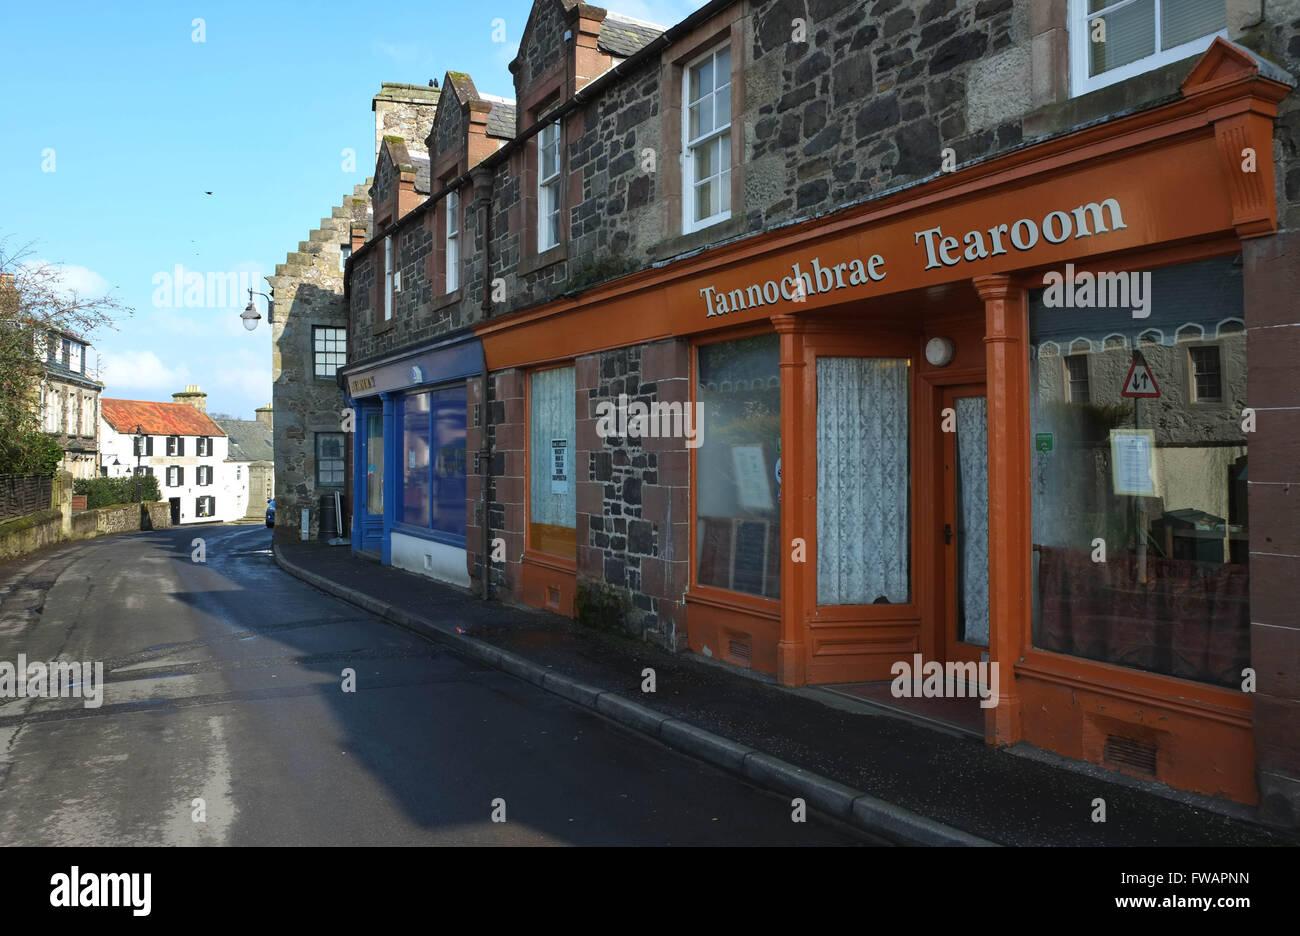 03/04/2016, The Tannochbrae Tearoom, Auchtermuchty, Fife, Scotland, - Stock Image